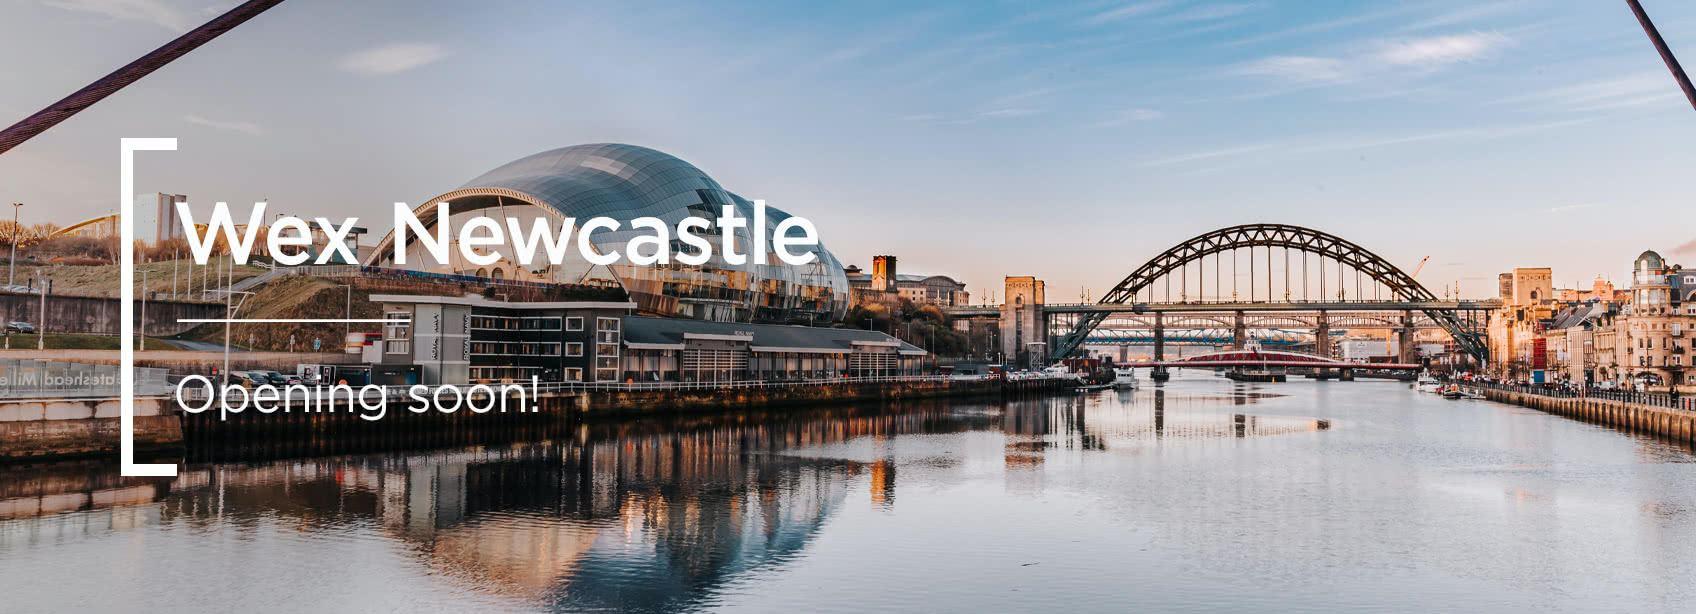 Wex Photo Video Newcastle